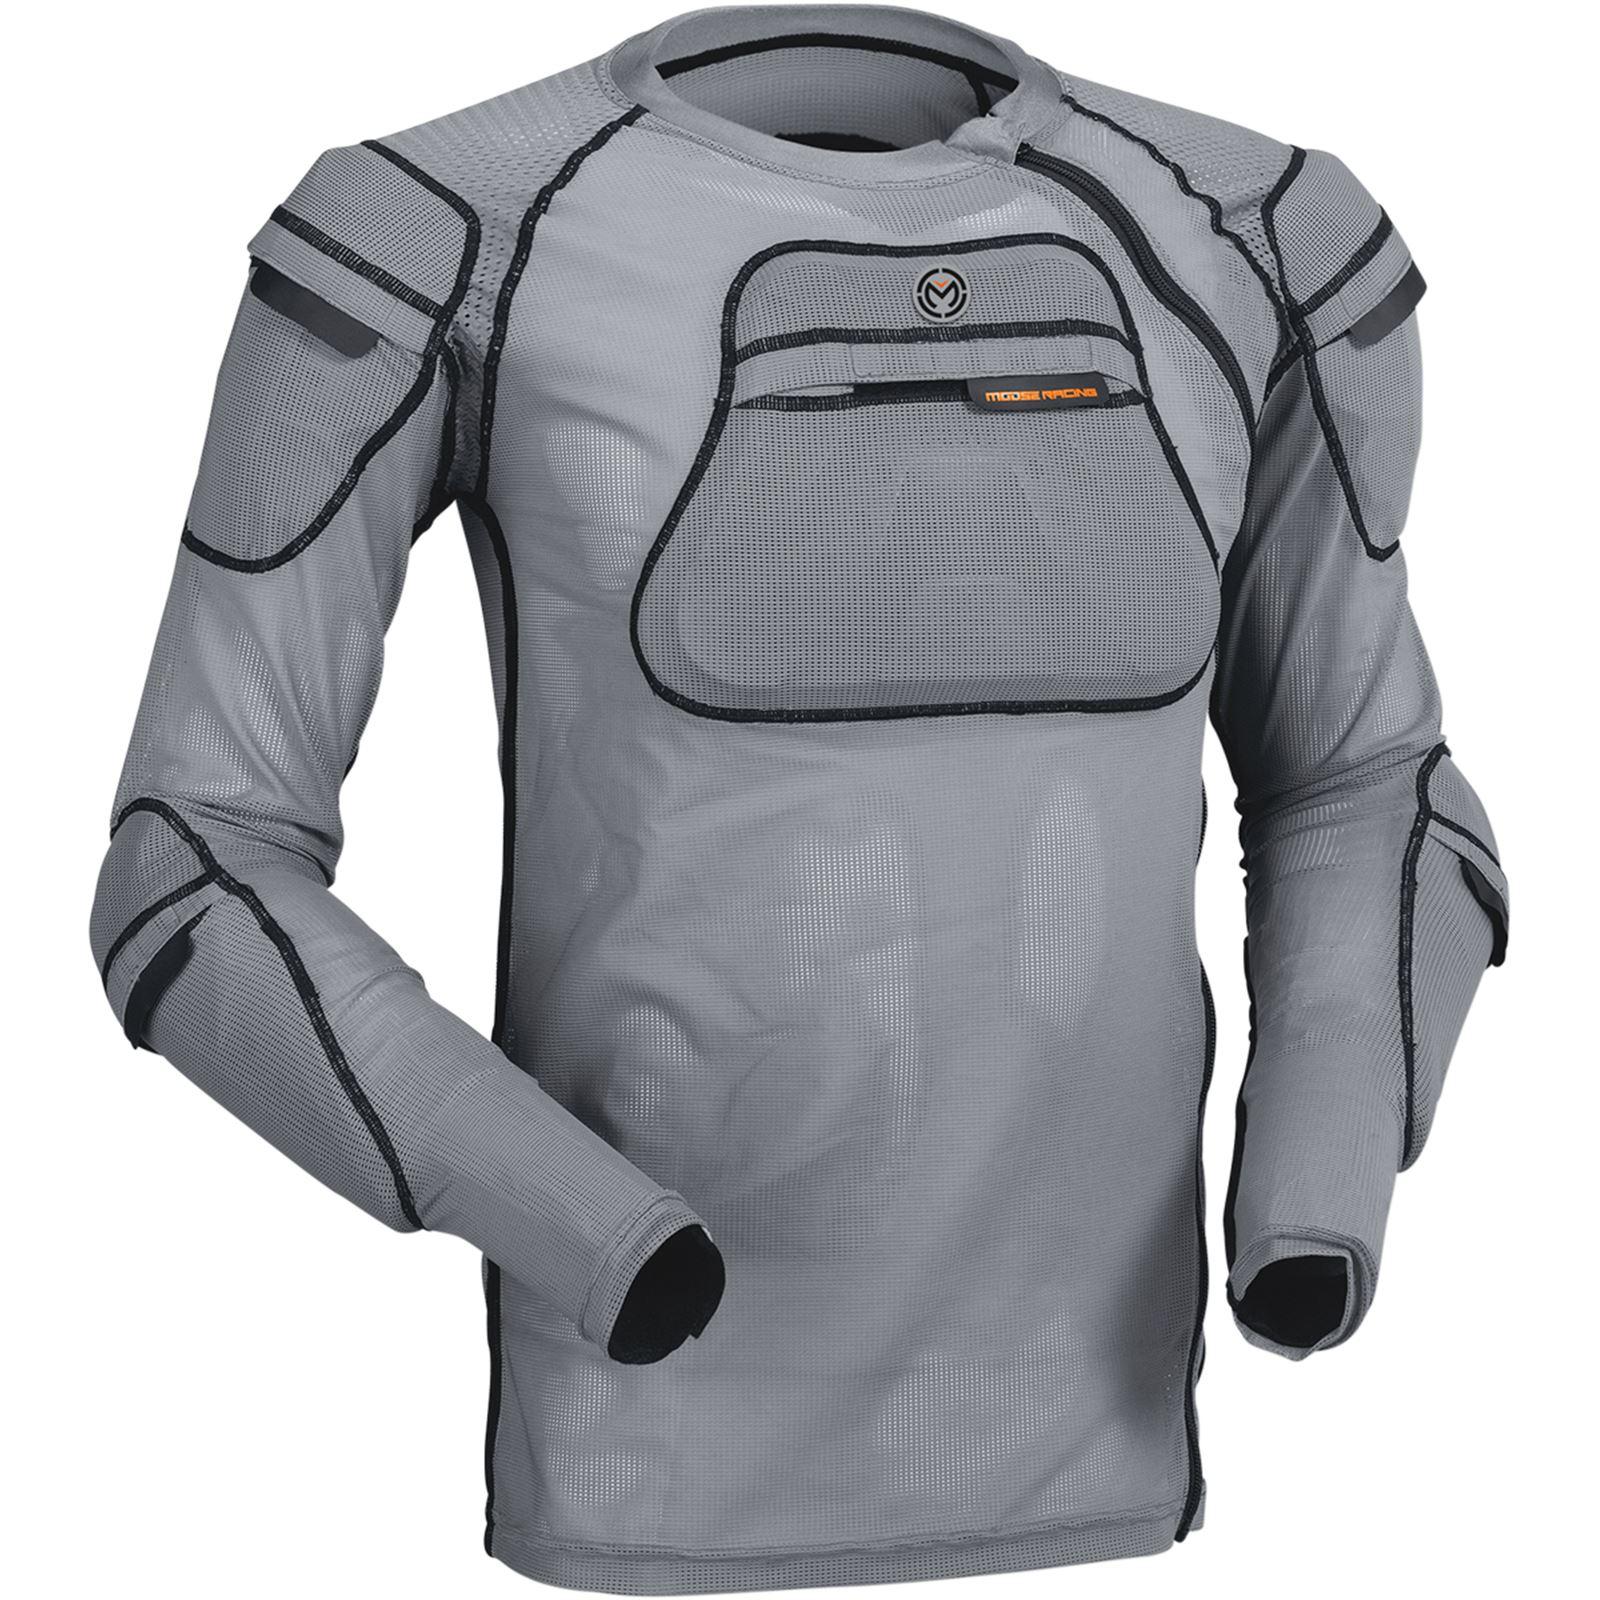 Moose Racing XC1 Body Armor - Gray - 2X-Large/3X-Large